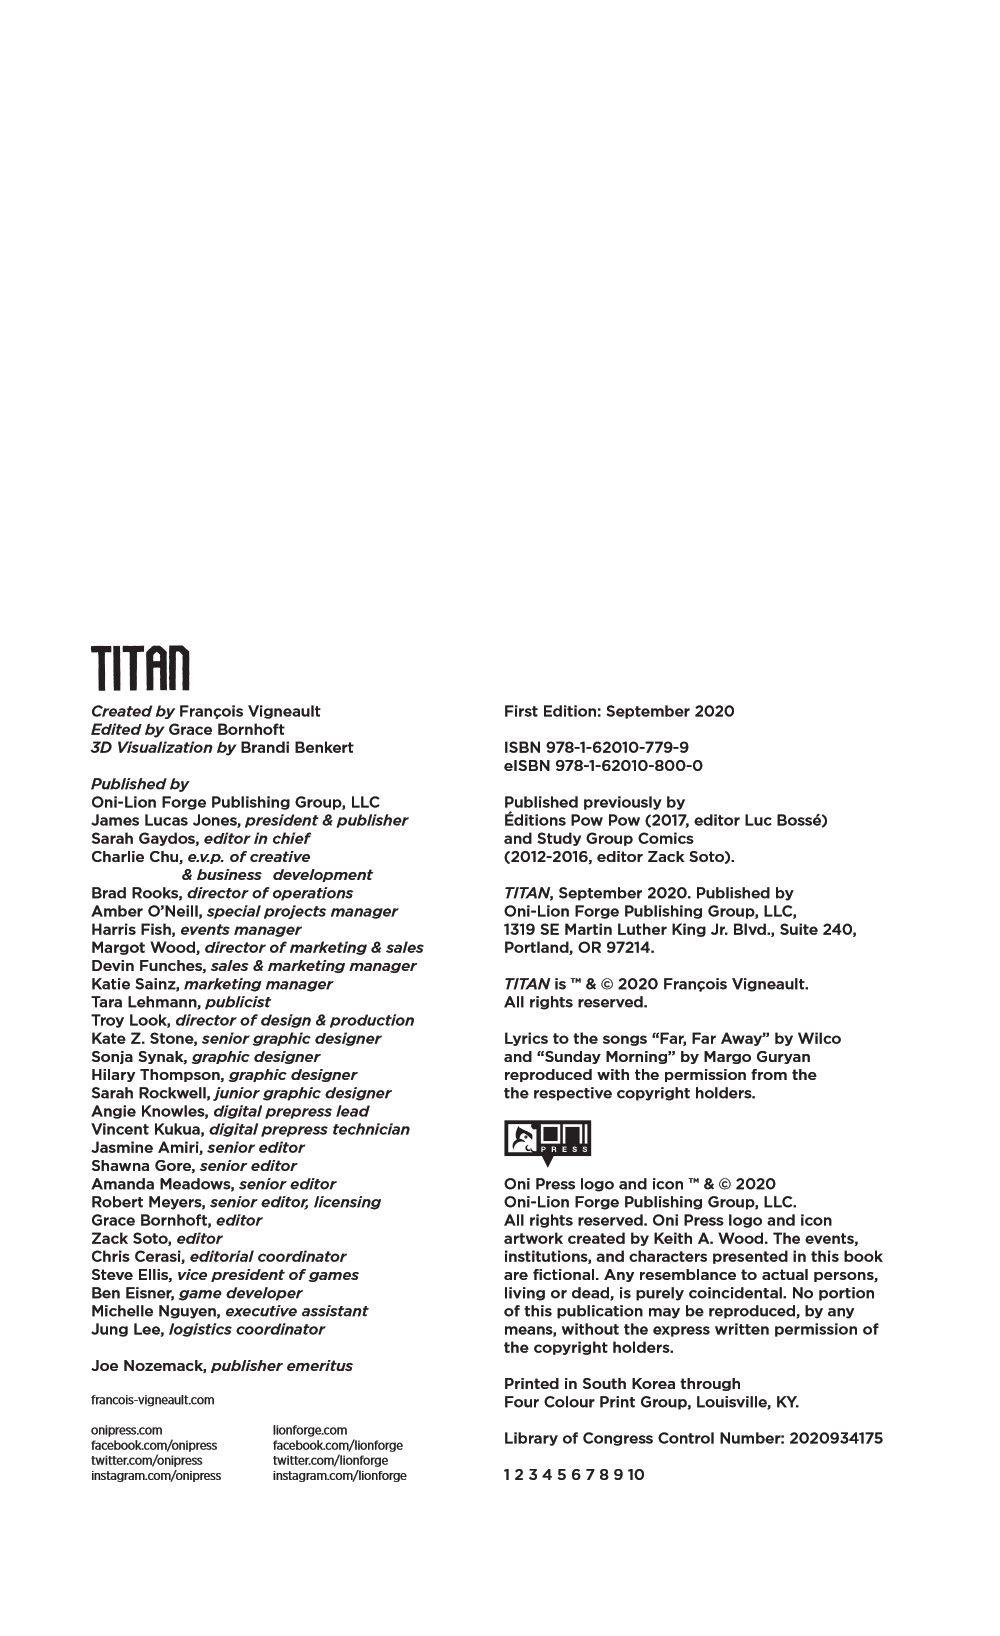 TITAN-REFERENCE-007 ComicList Previews: TITAN GN